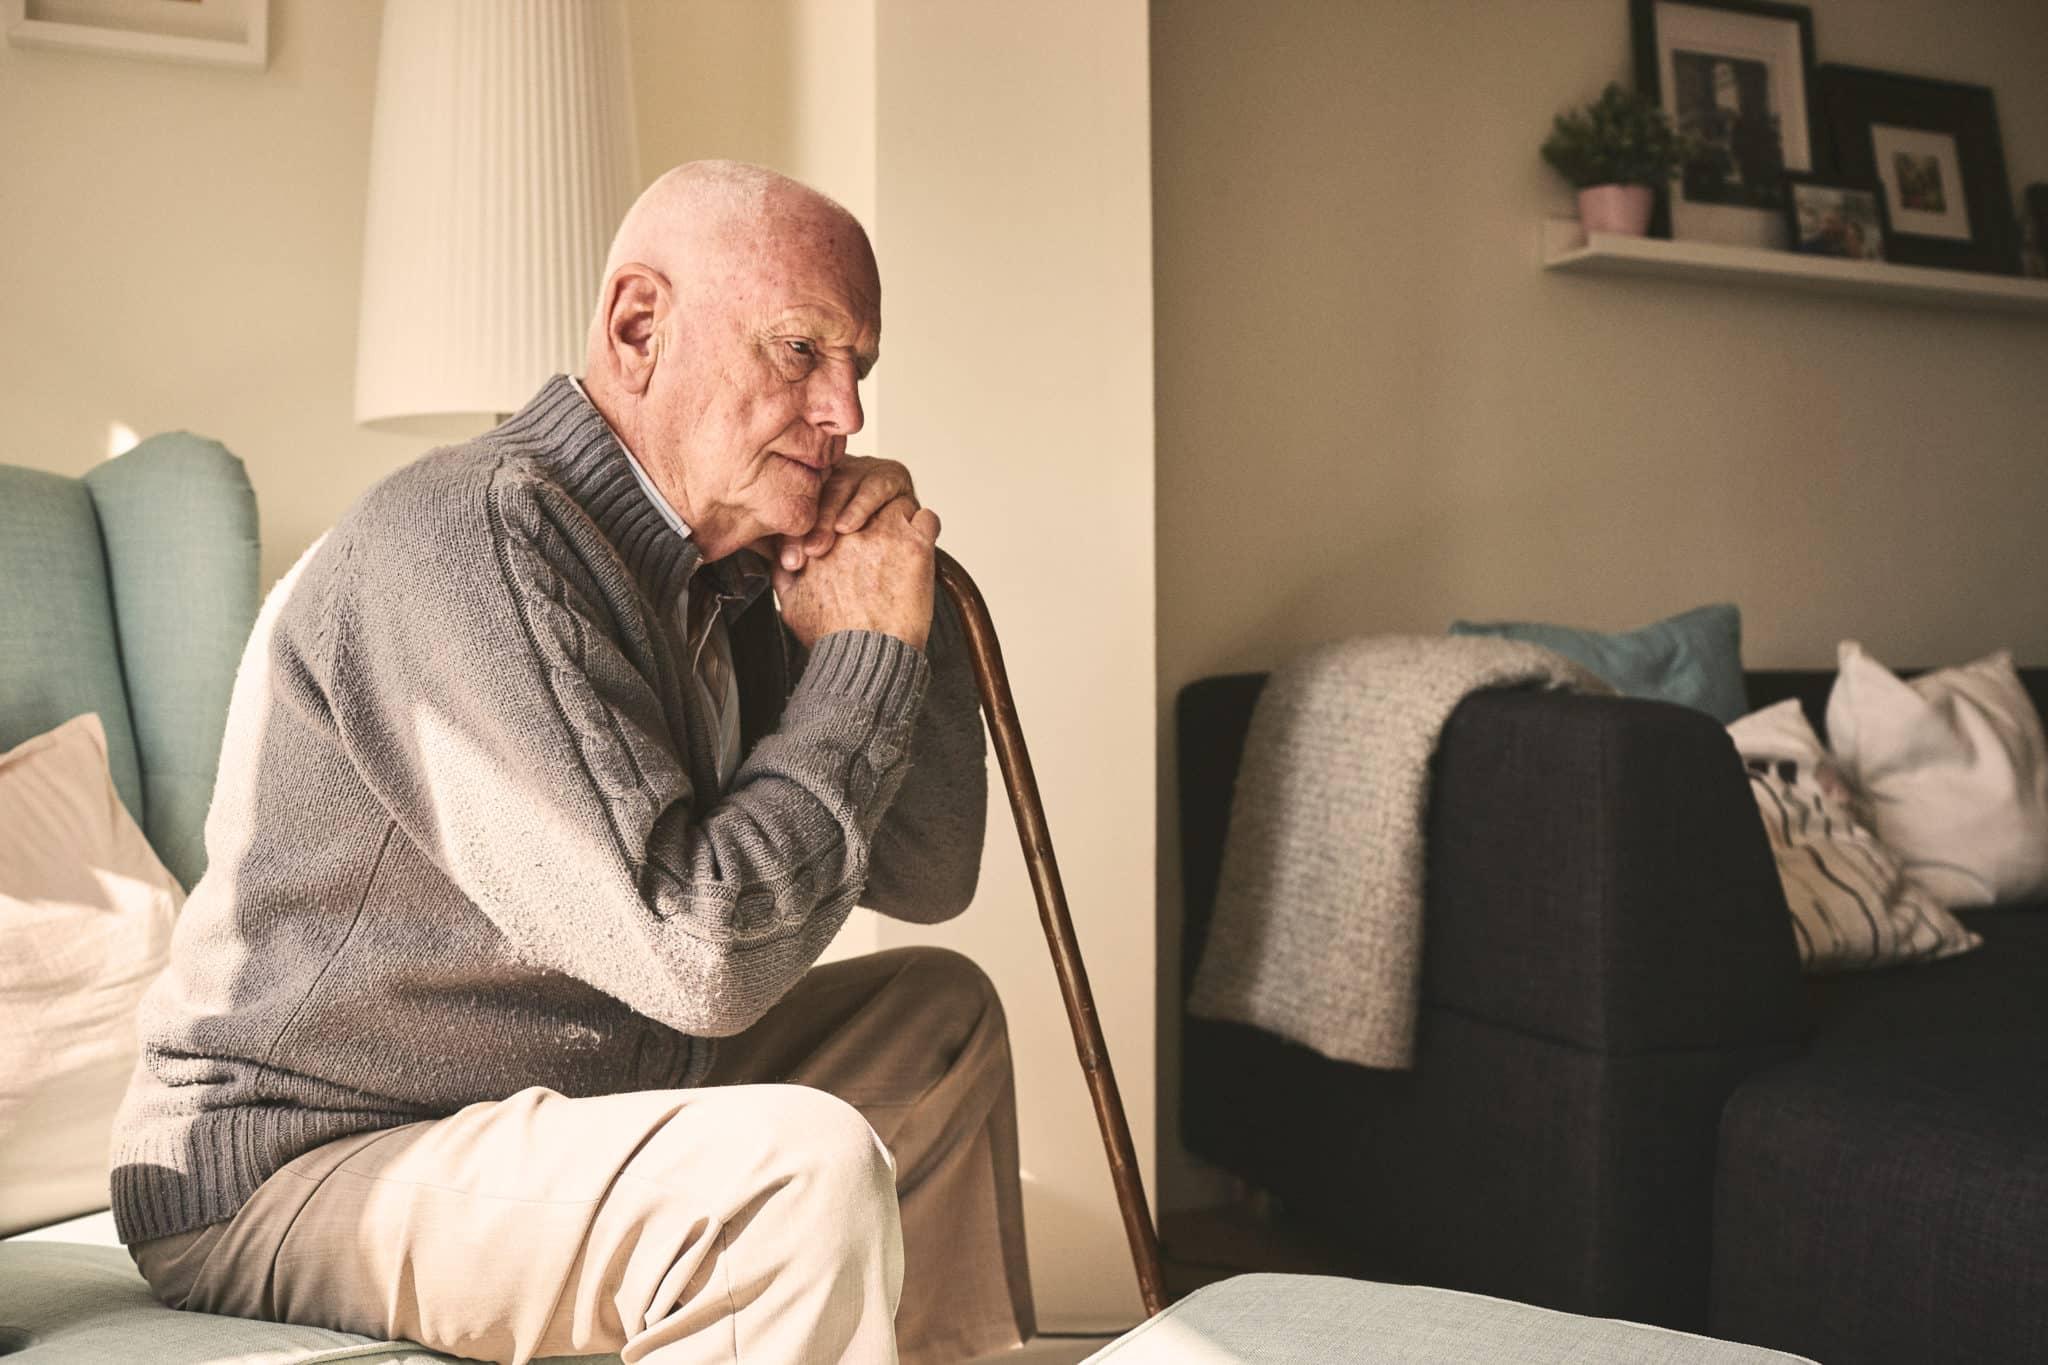 lderly man in a nursing home in Huntington, WV